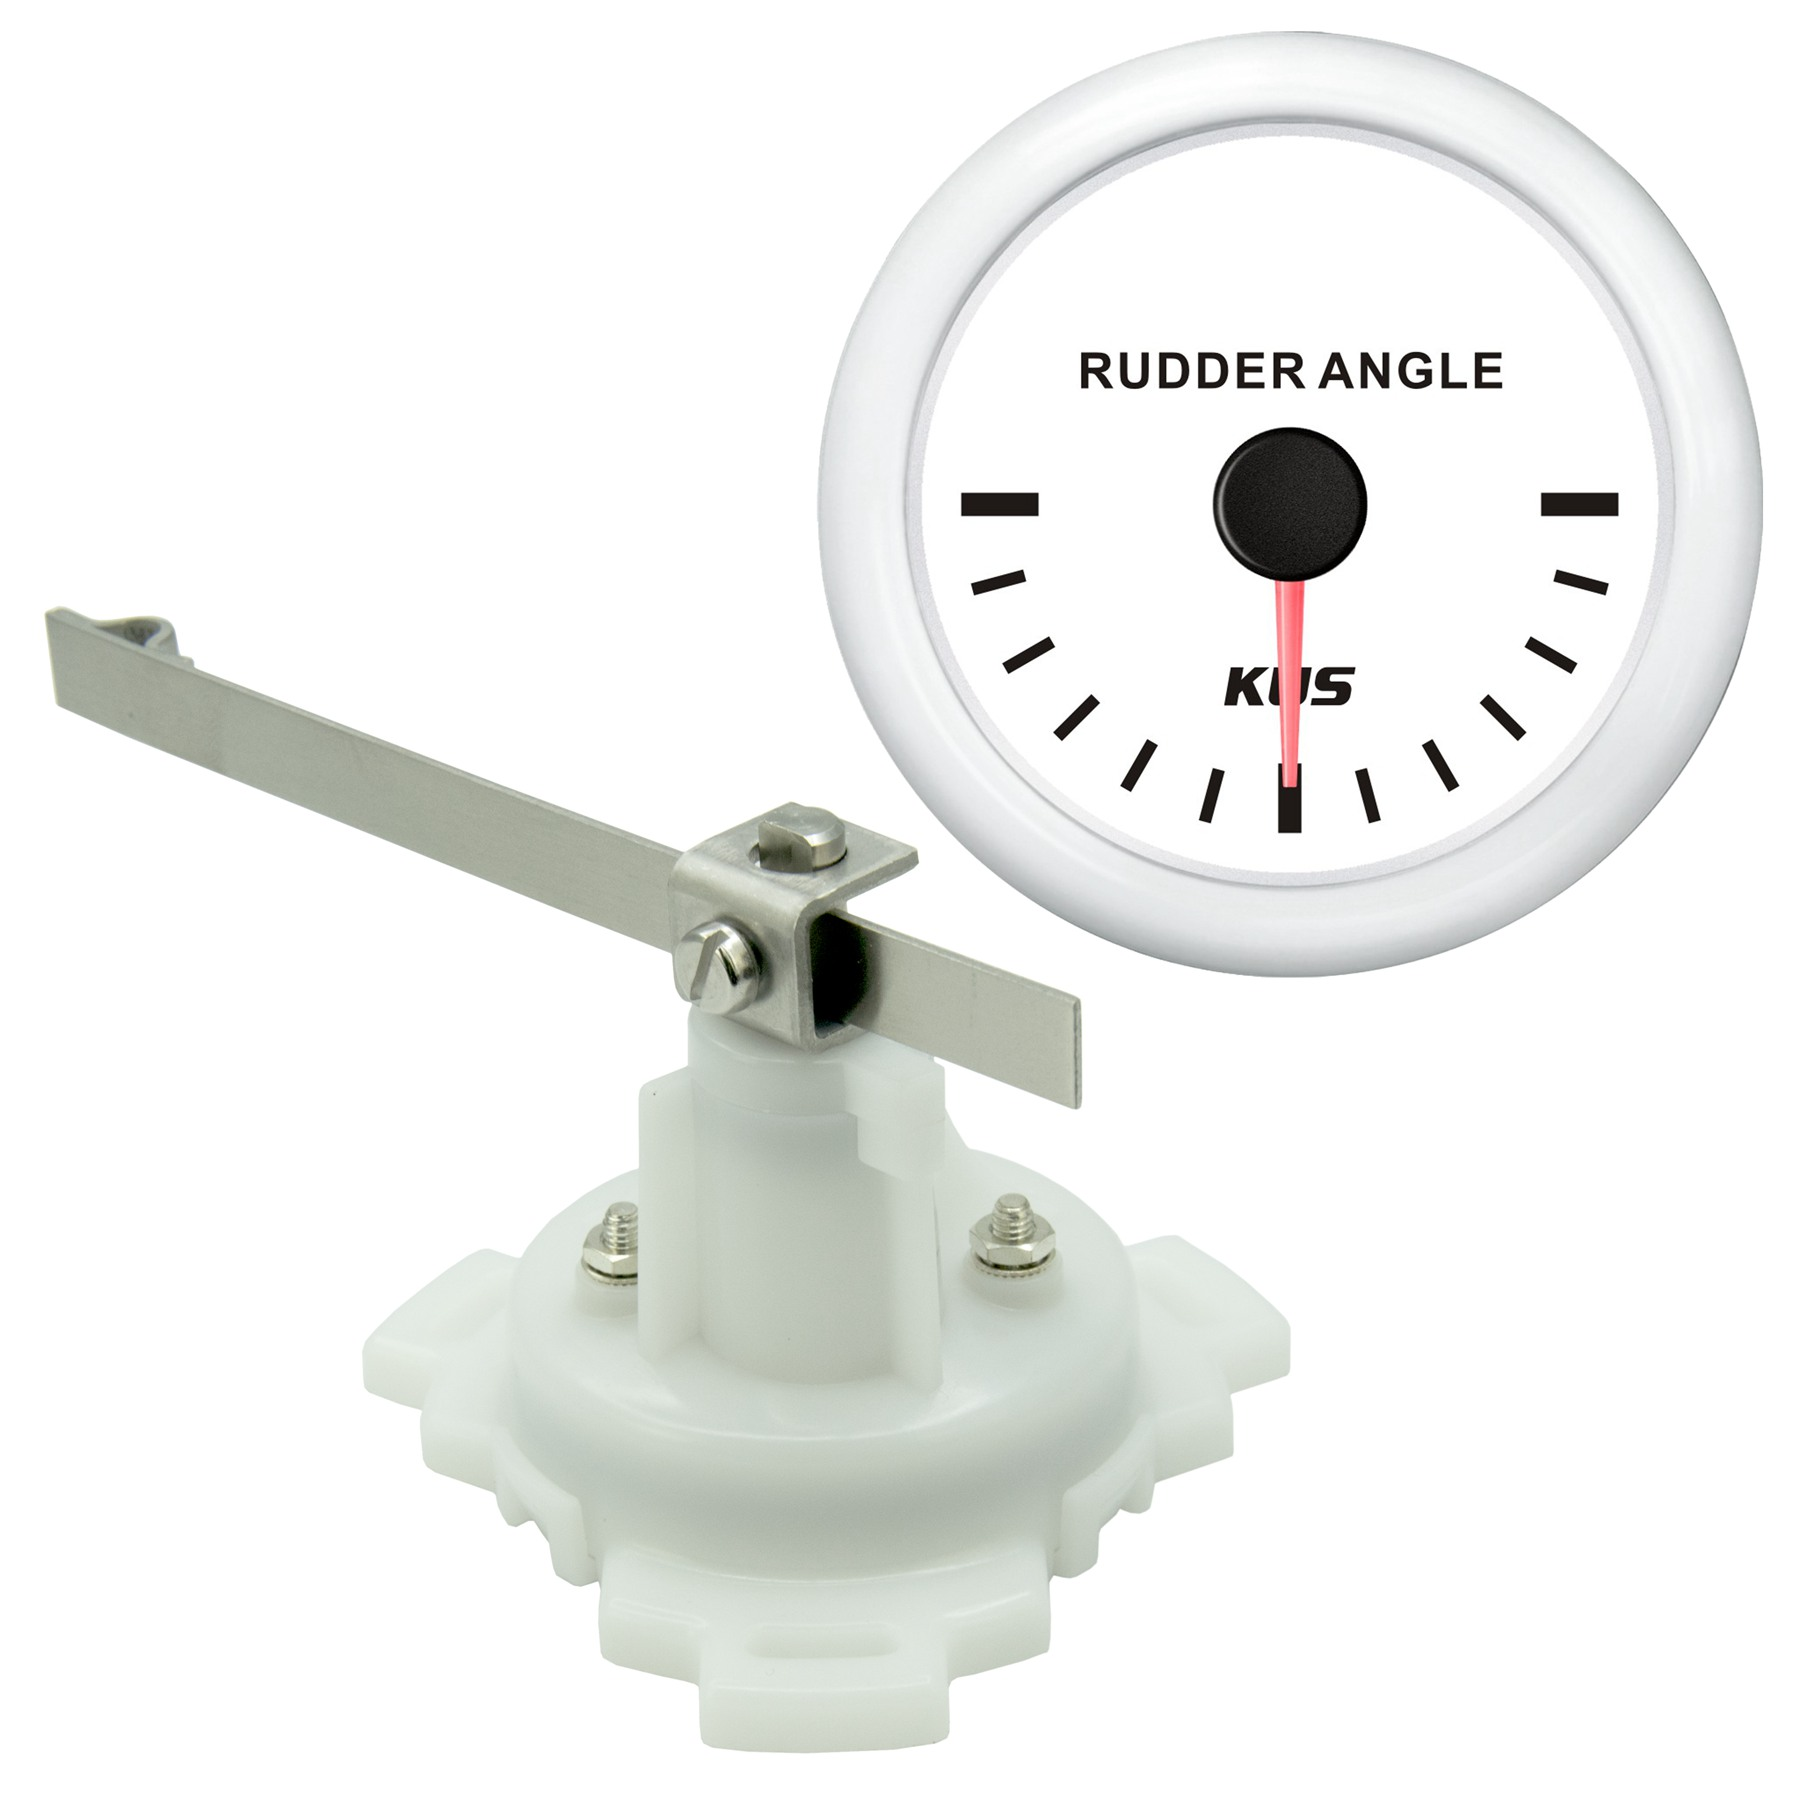 KUS Marine Rudder Angle Indicator Gauge 12/24V With Rudder Sensor 0-190ohms 52mm датчик kus 12v 24v